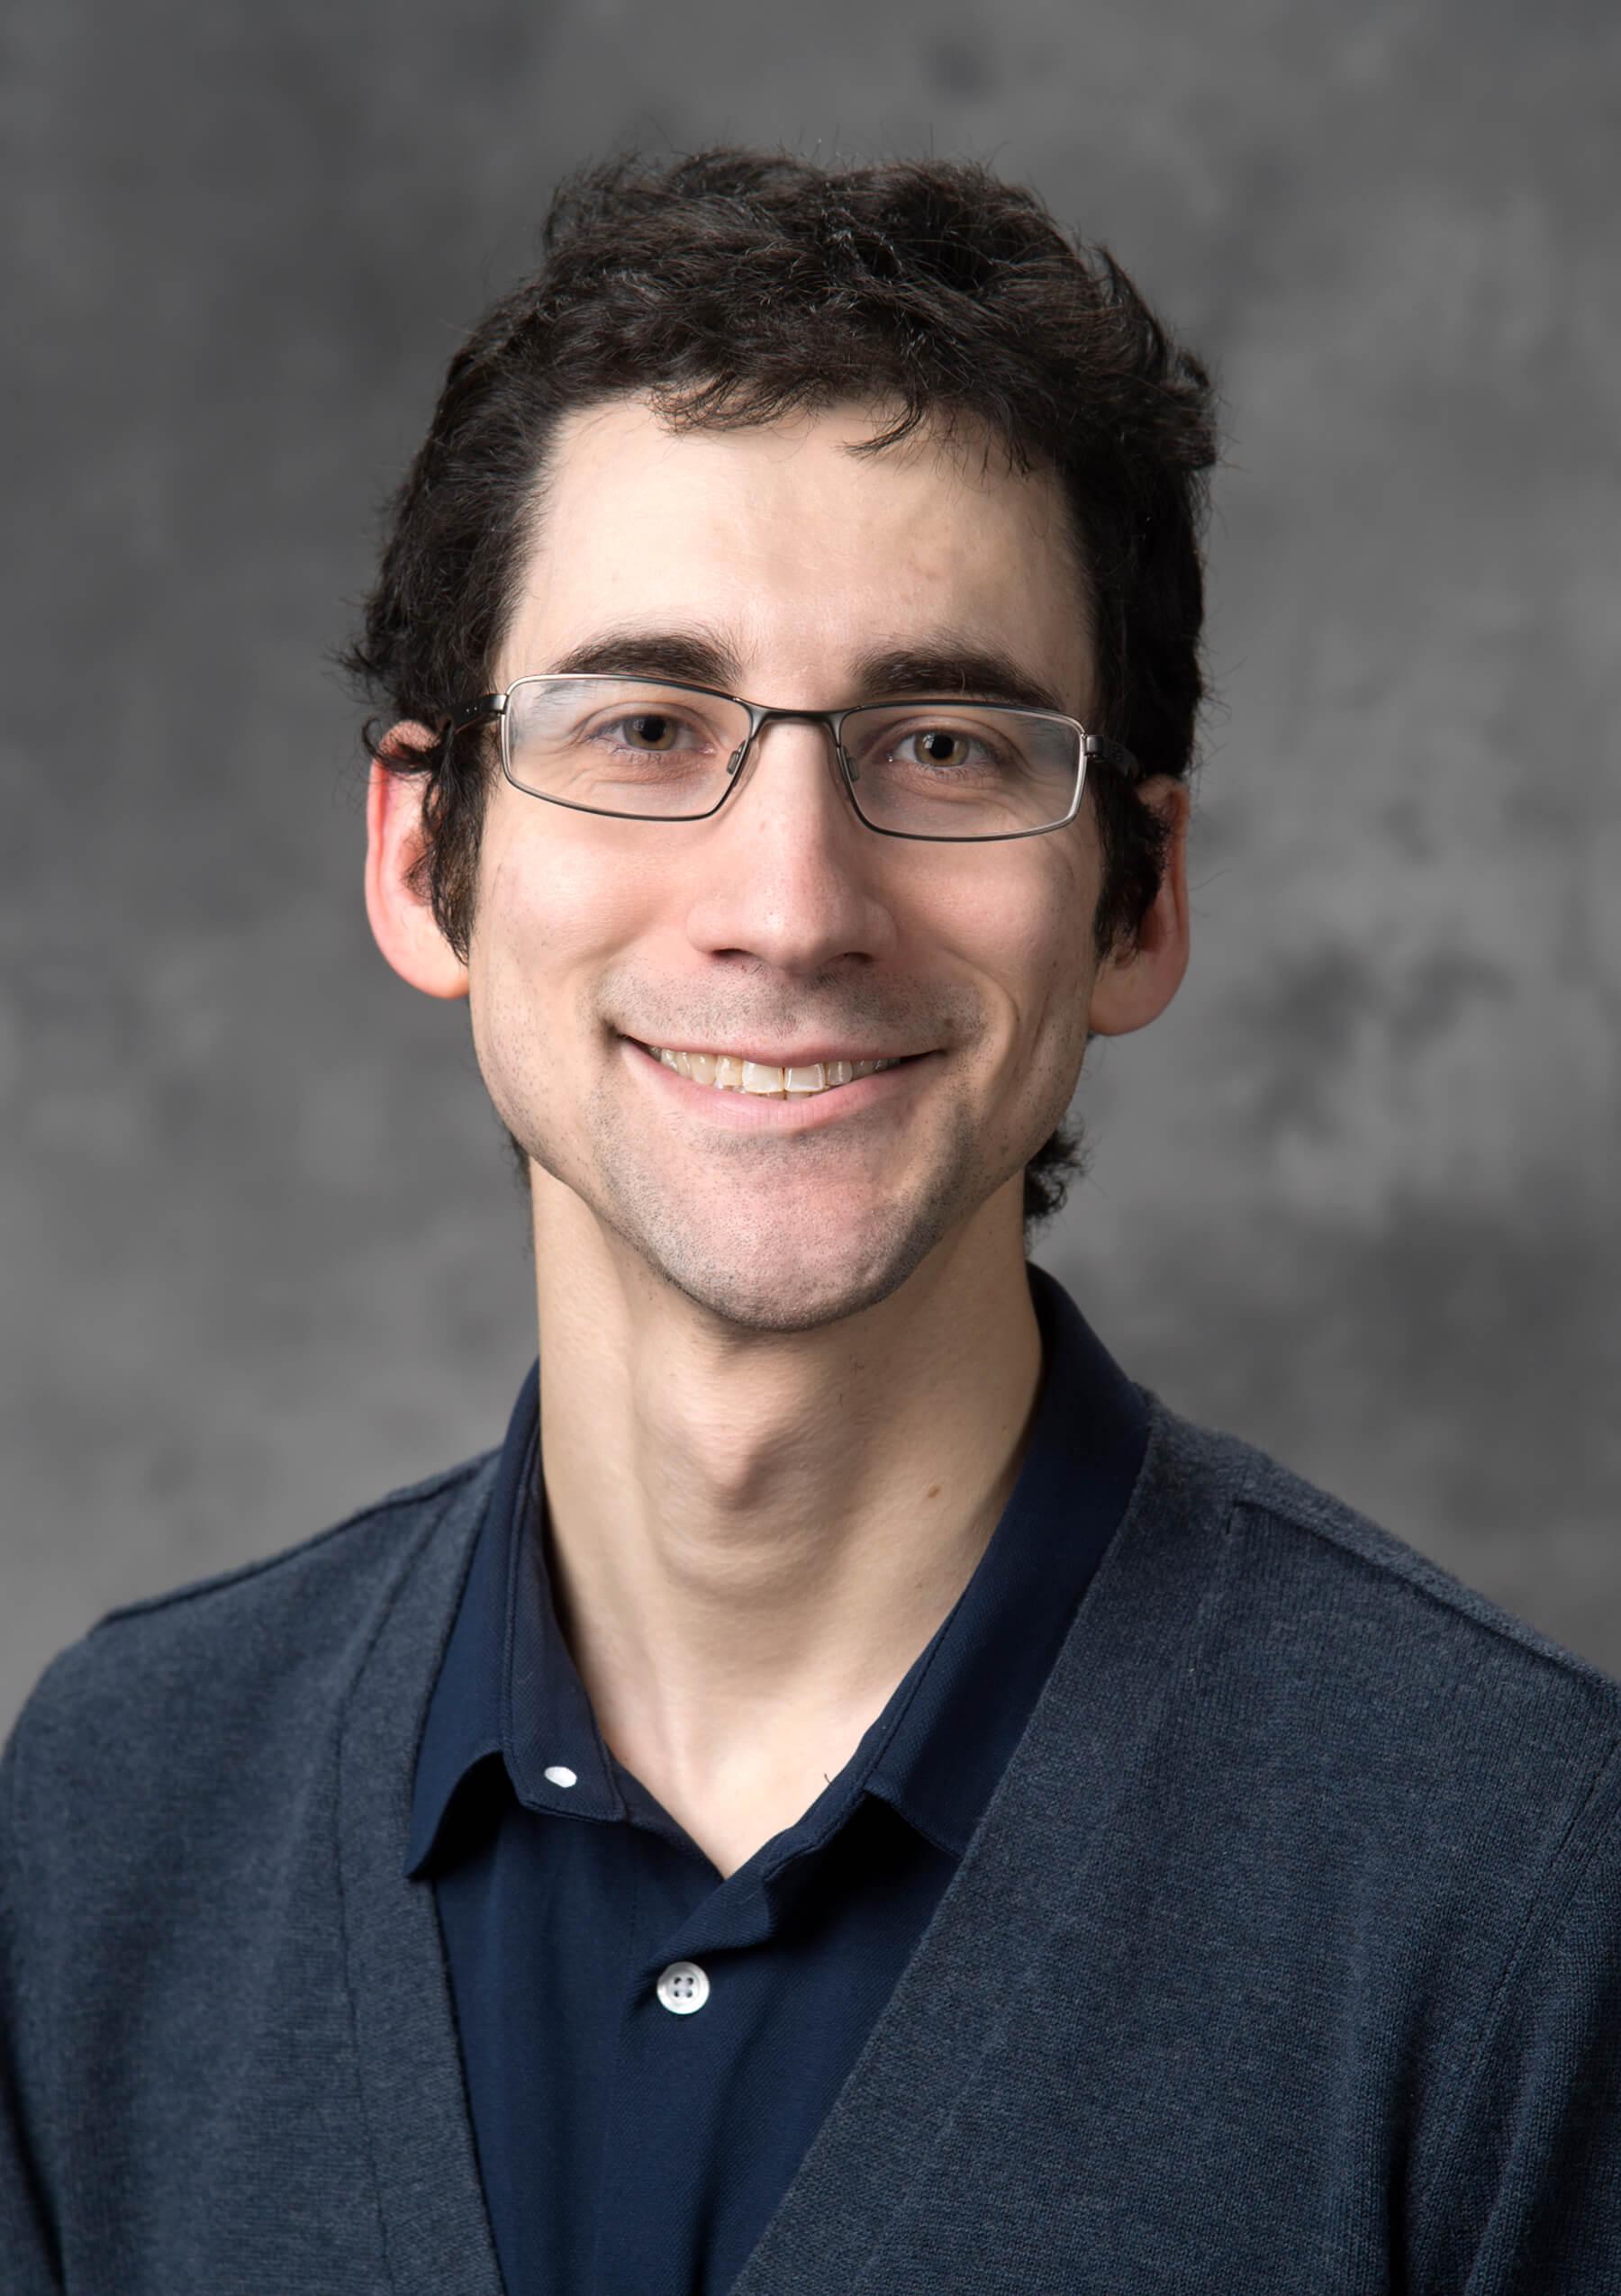 Headshot of Benji Milanowski of Purdue University School of Nursing